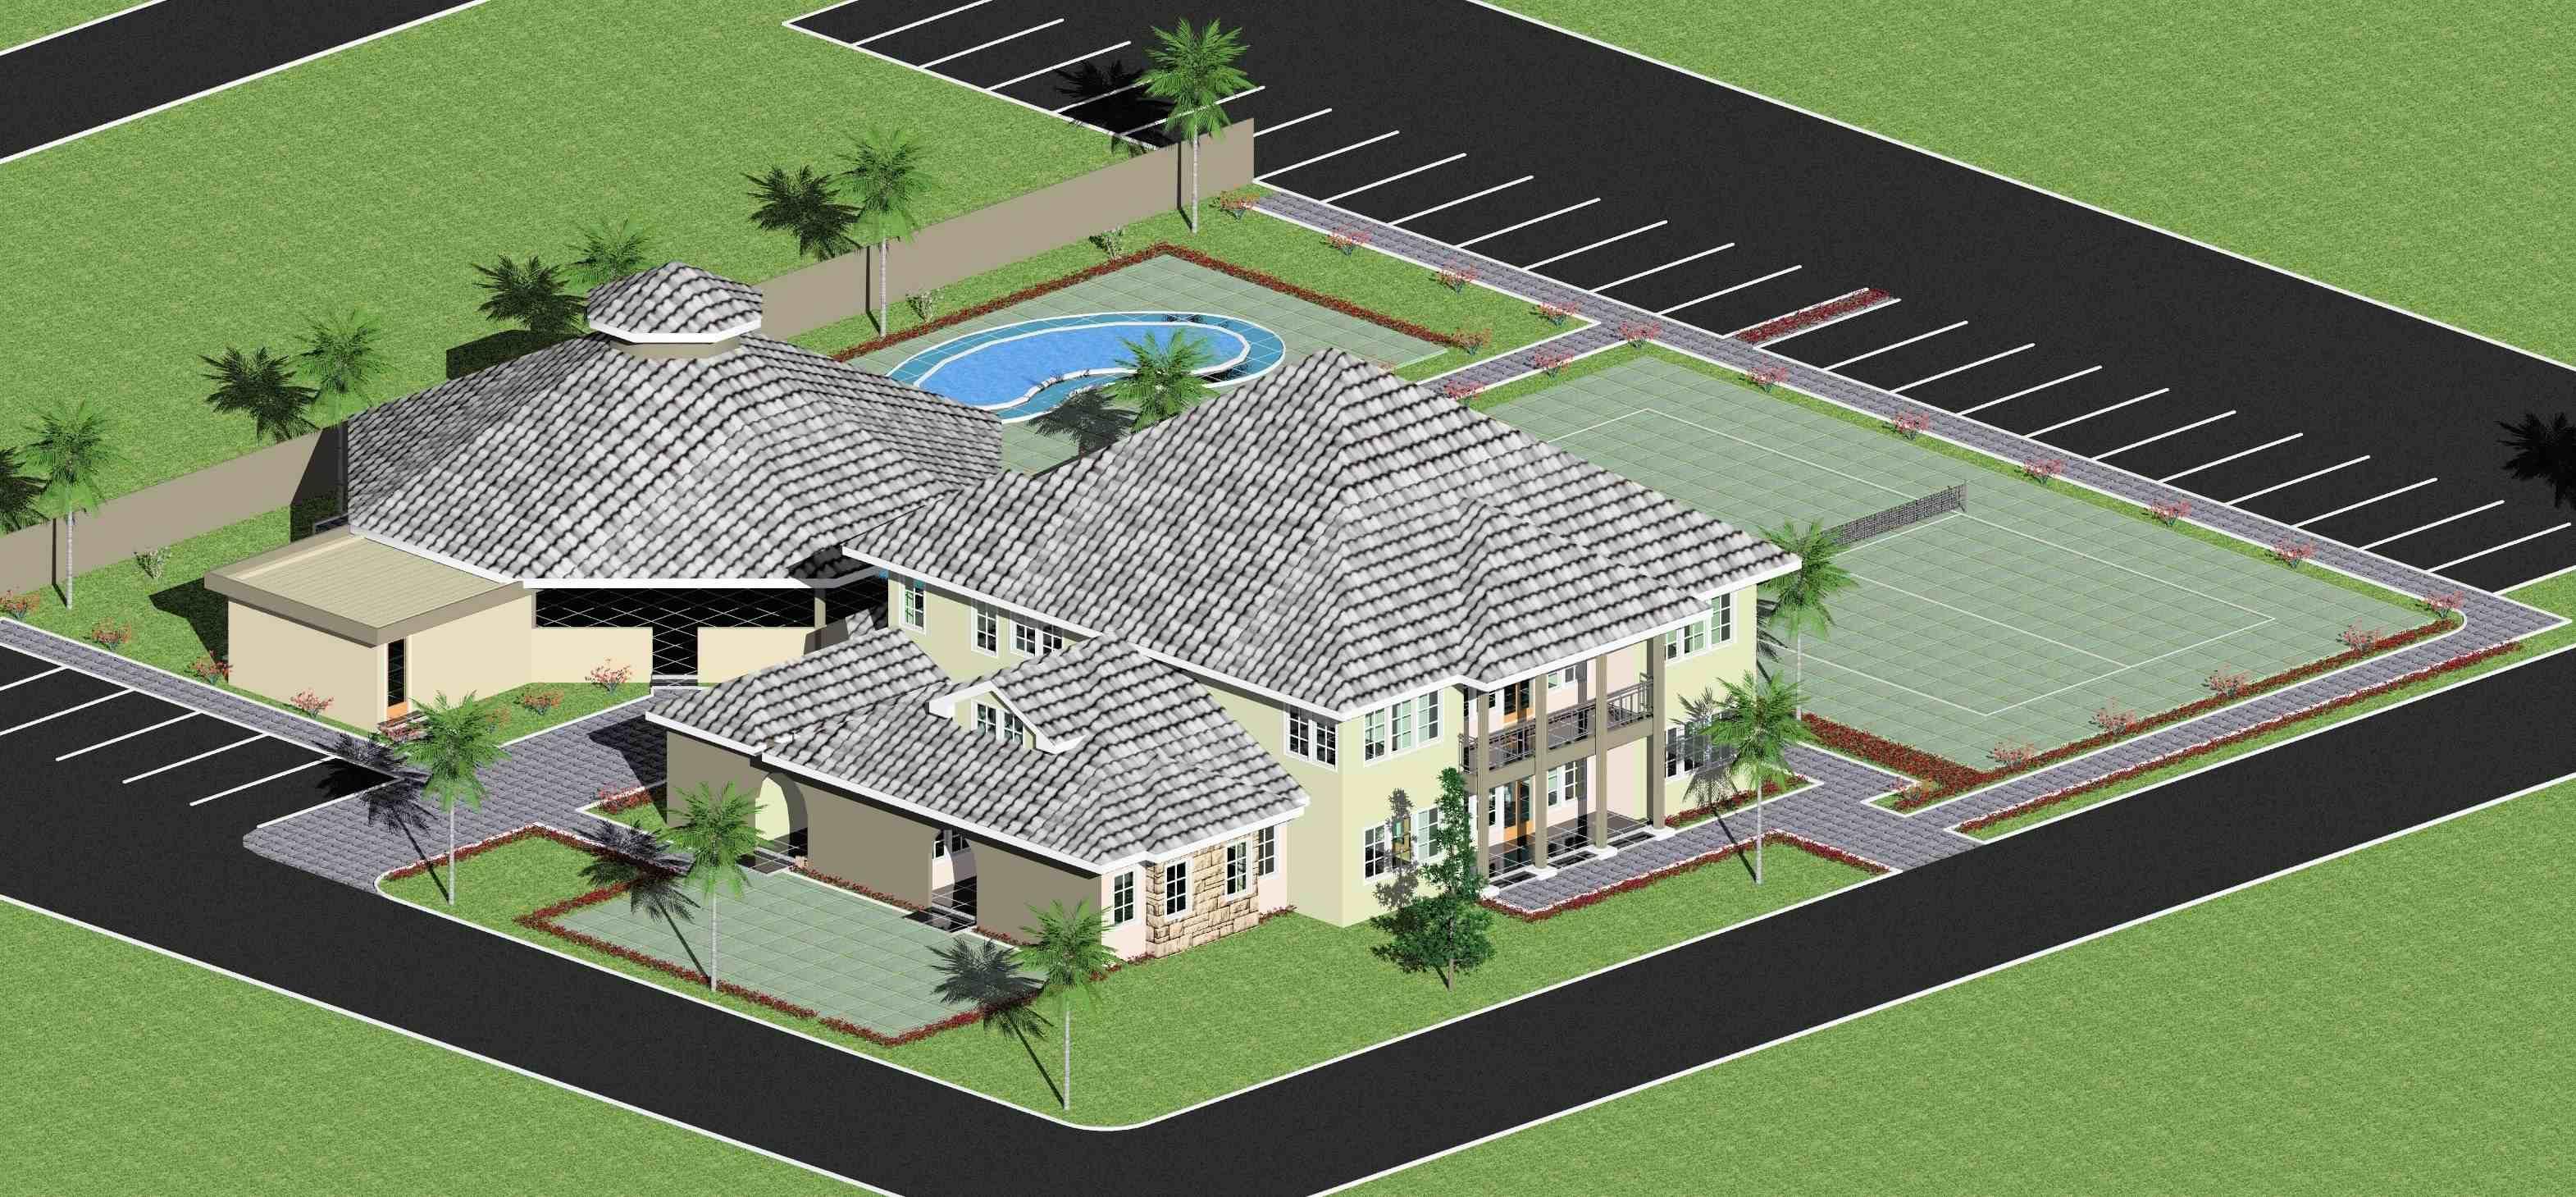 Ghana, Royal Luxury House Floor Plans on game room blueprints, balcony blueprints, garbage disposal blueprints, gate blueprints, basketball court blueprints, bbq blueprints, futurama blueprints, large bedroom blueprints, prison break blueprints, the shield blueprints, fitness blueprints, supernatural blueprints, marina blueprints,